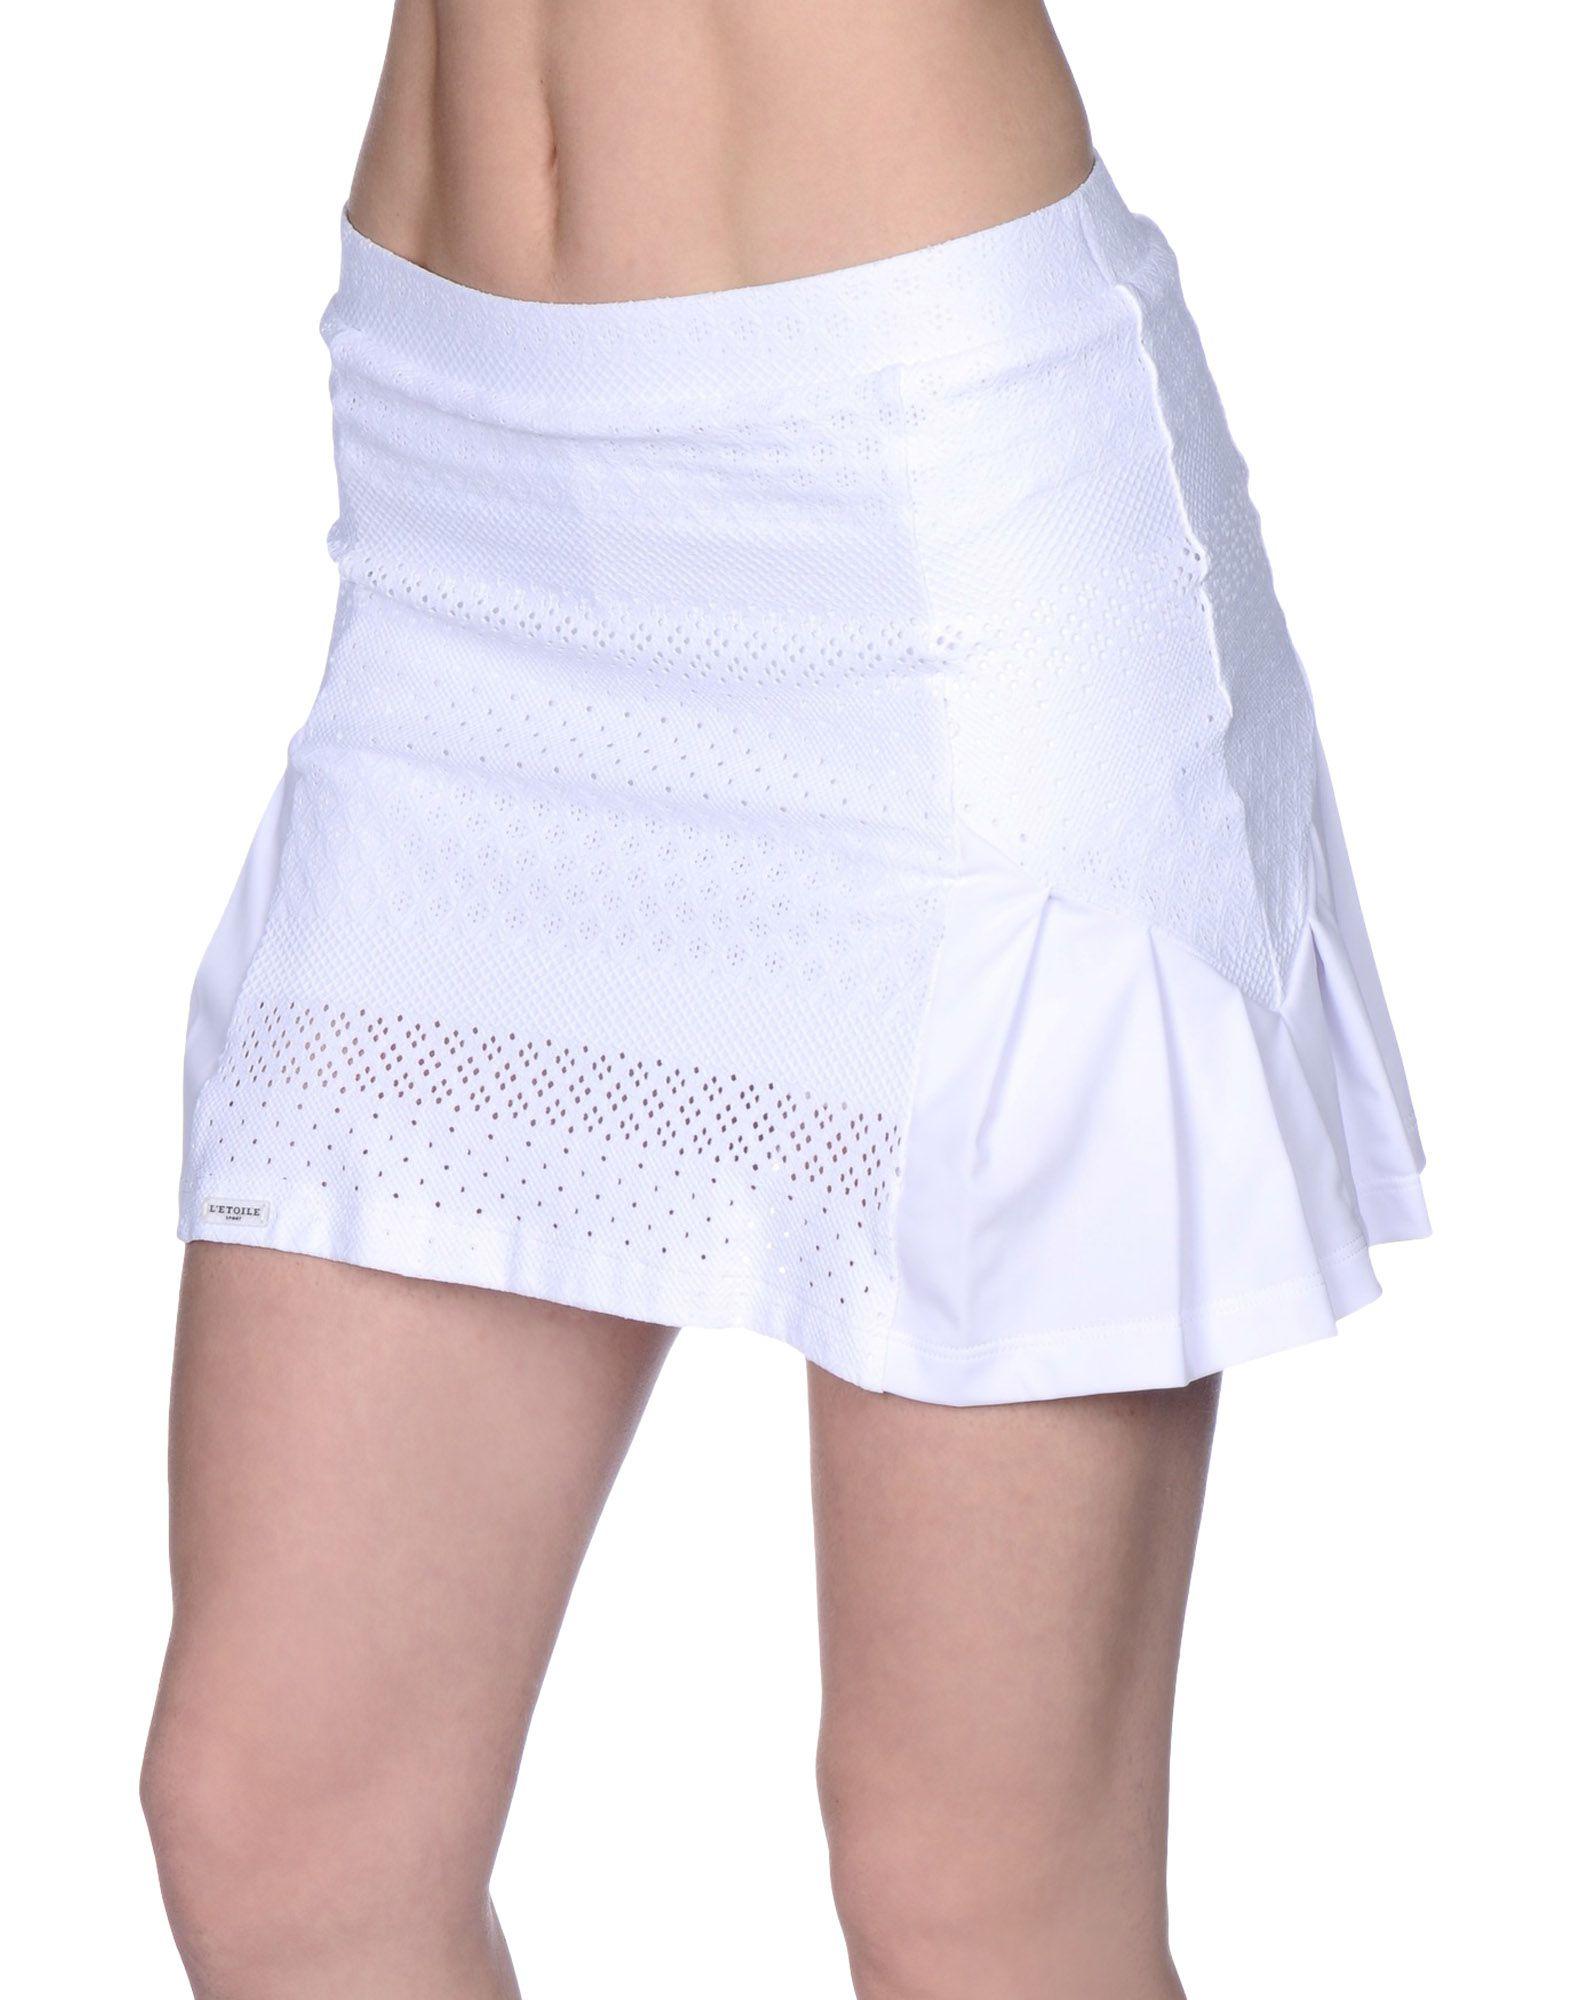 L'ETOILE SPORT Мини-юбка sport dress katrus платья и сарафаны мини короткие